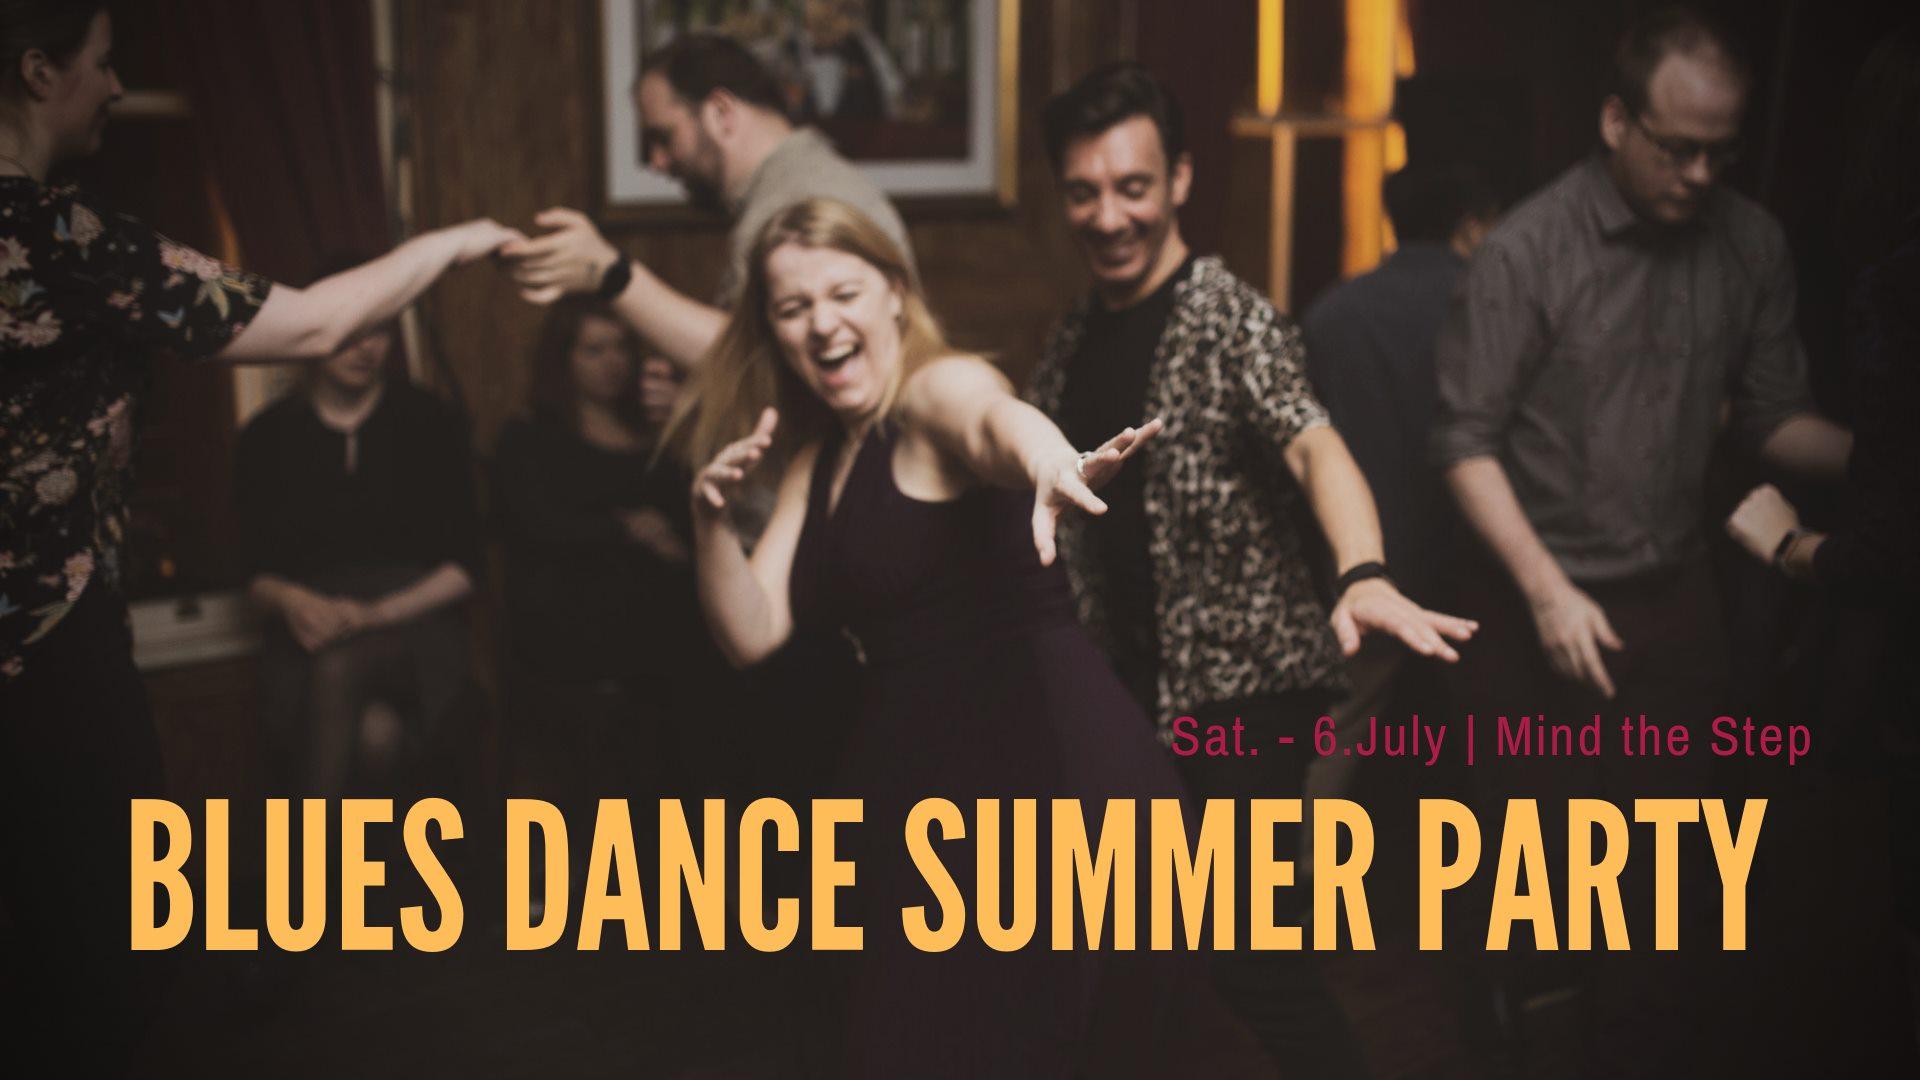 Blues Dance Summer Party